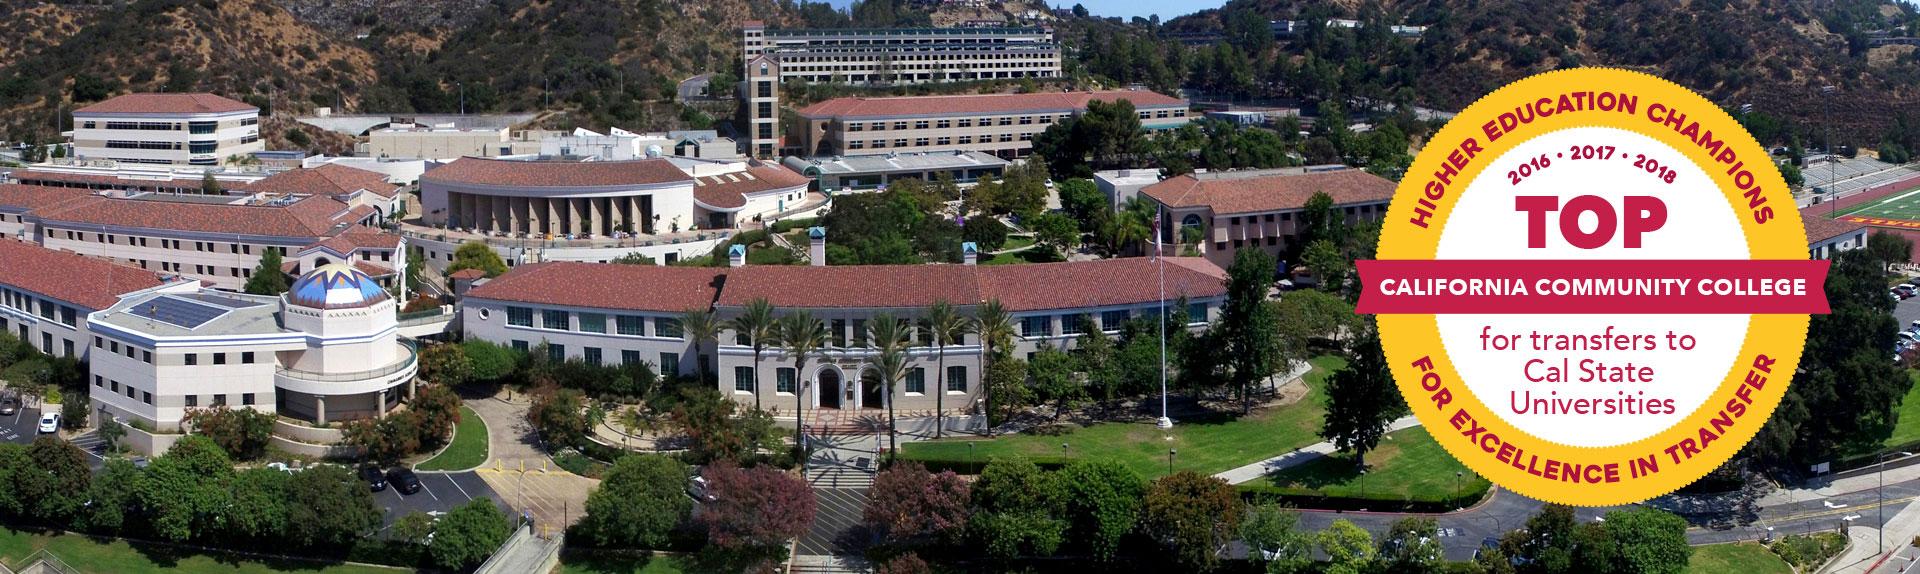 Glendale Community College.